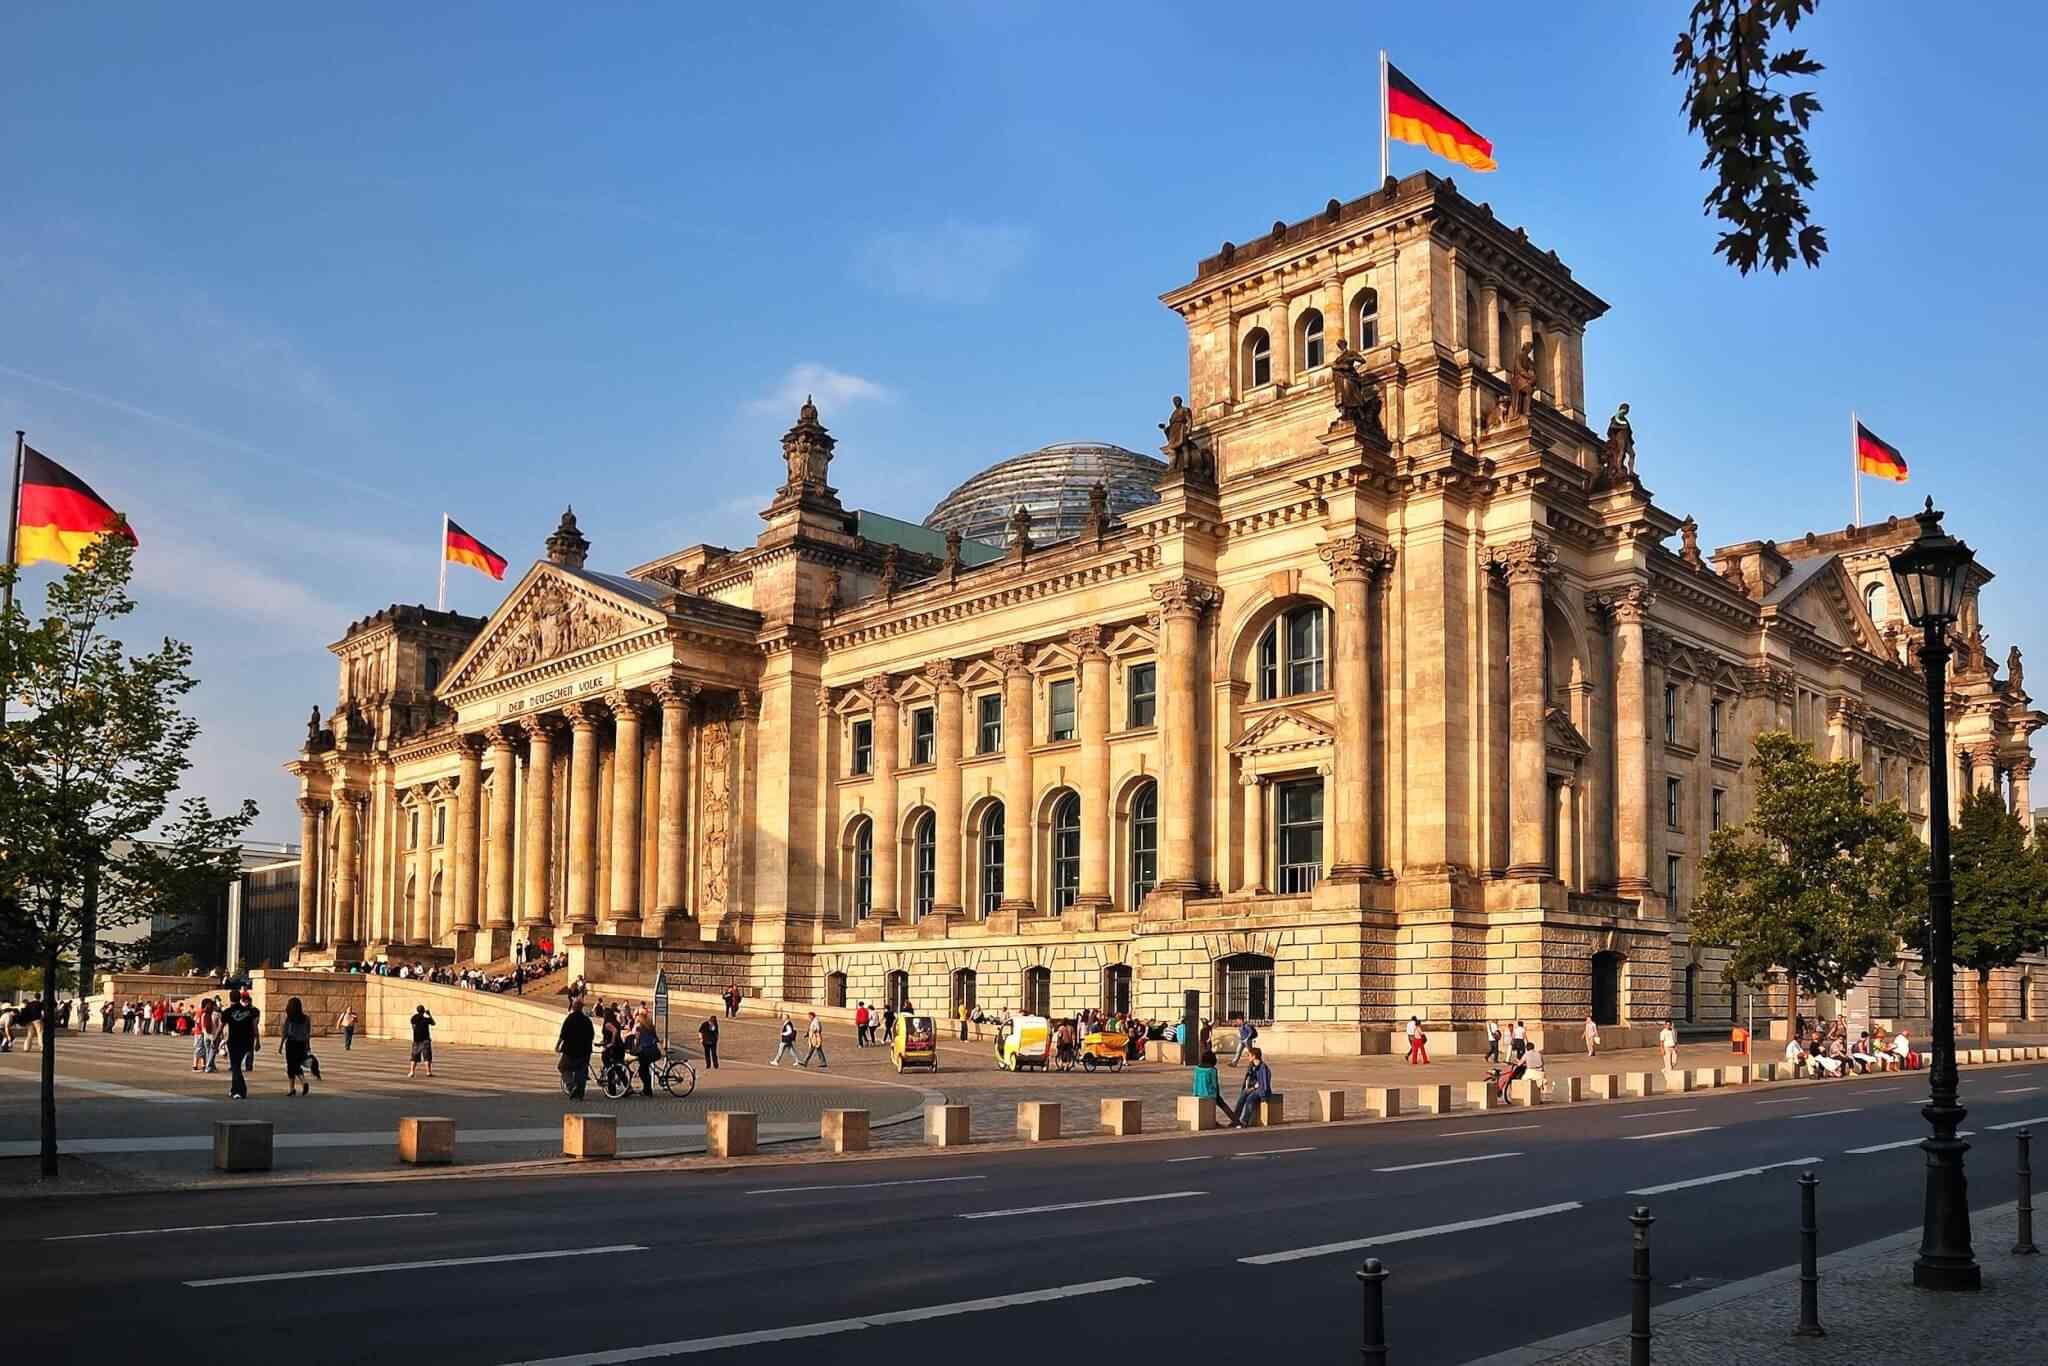 https://viveunbuenviaje.com/wp-content/uploads/2018/09/destination-berlin-01.jpg